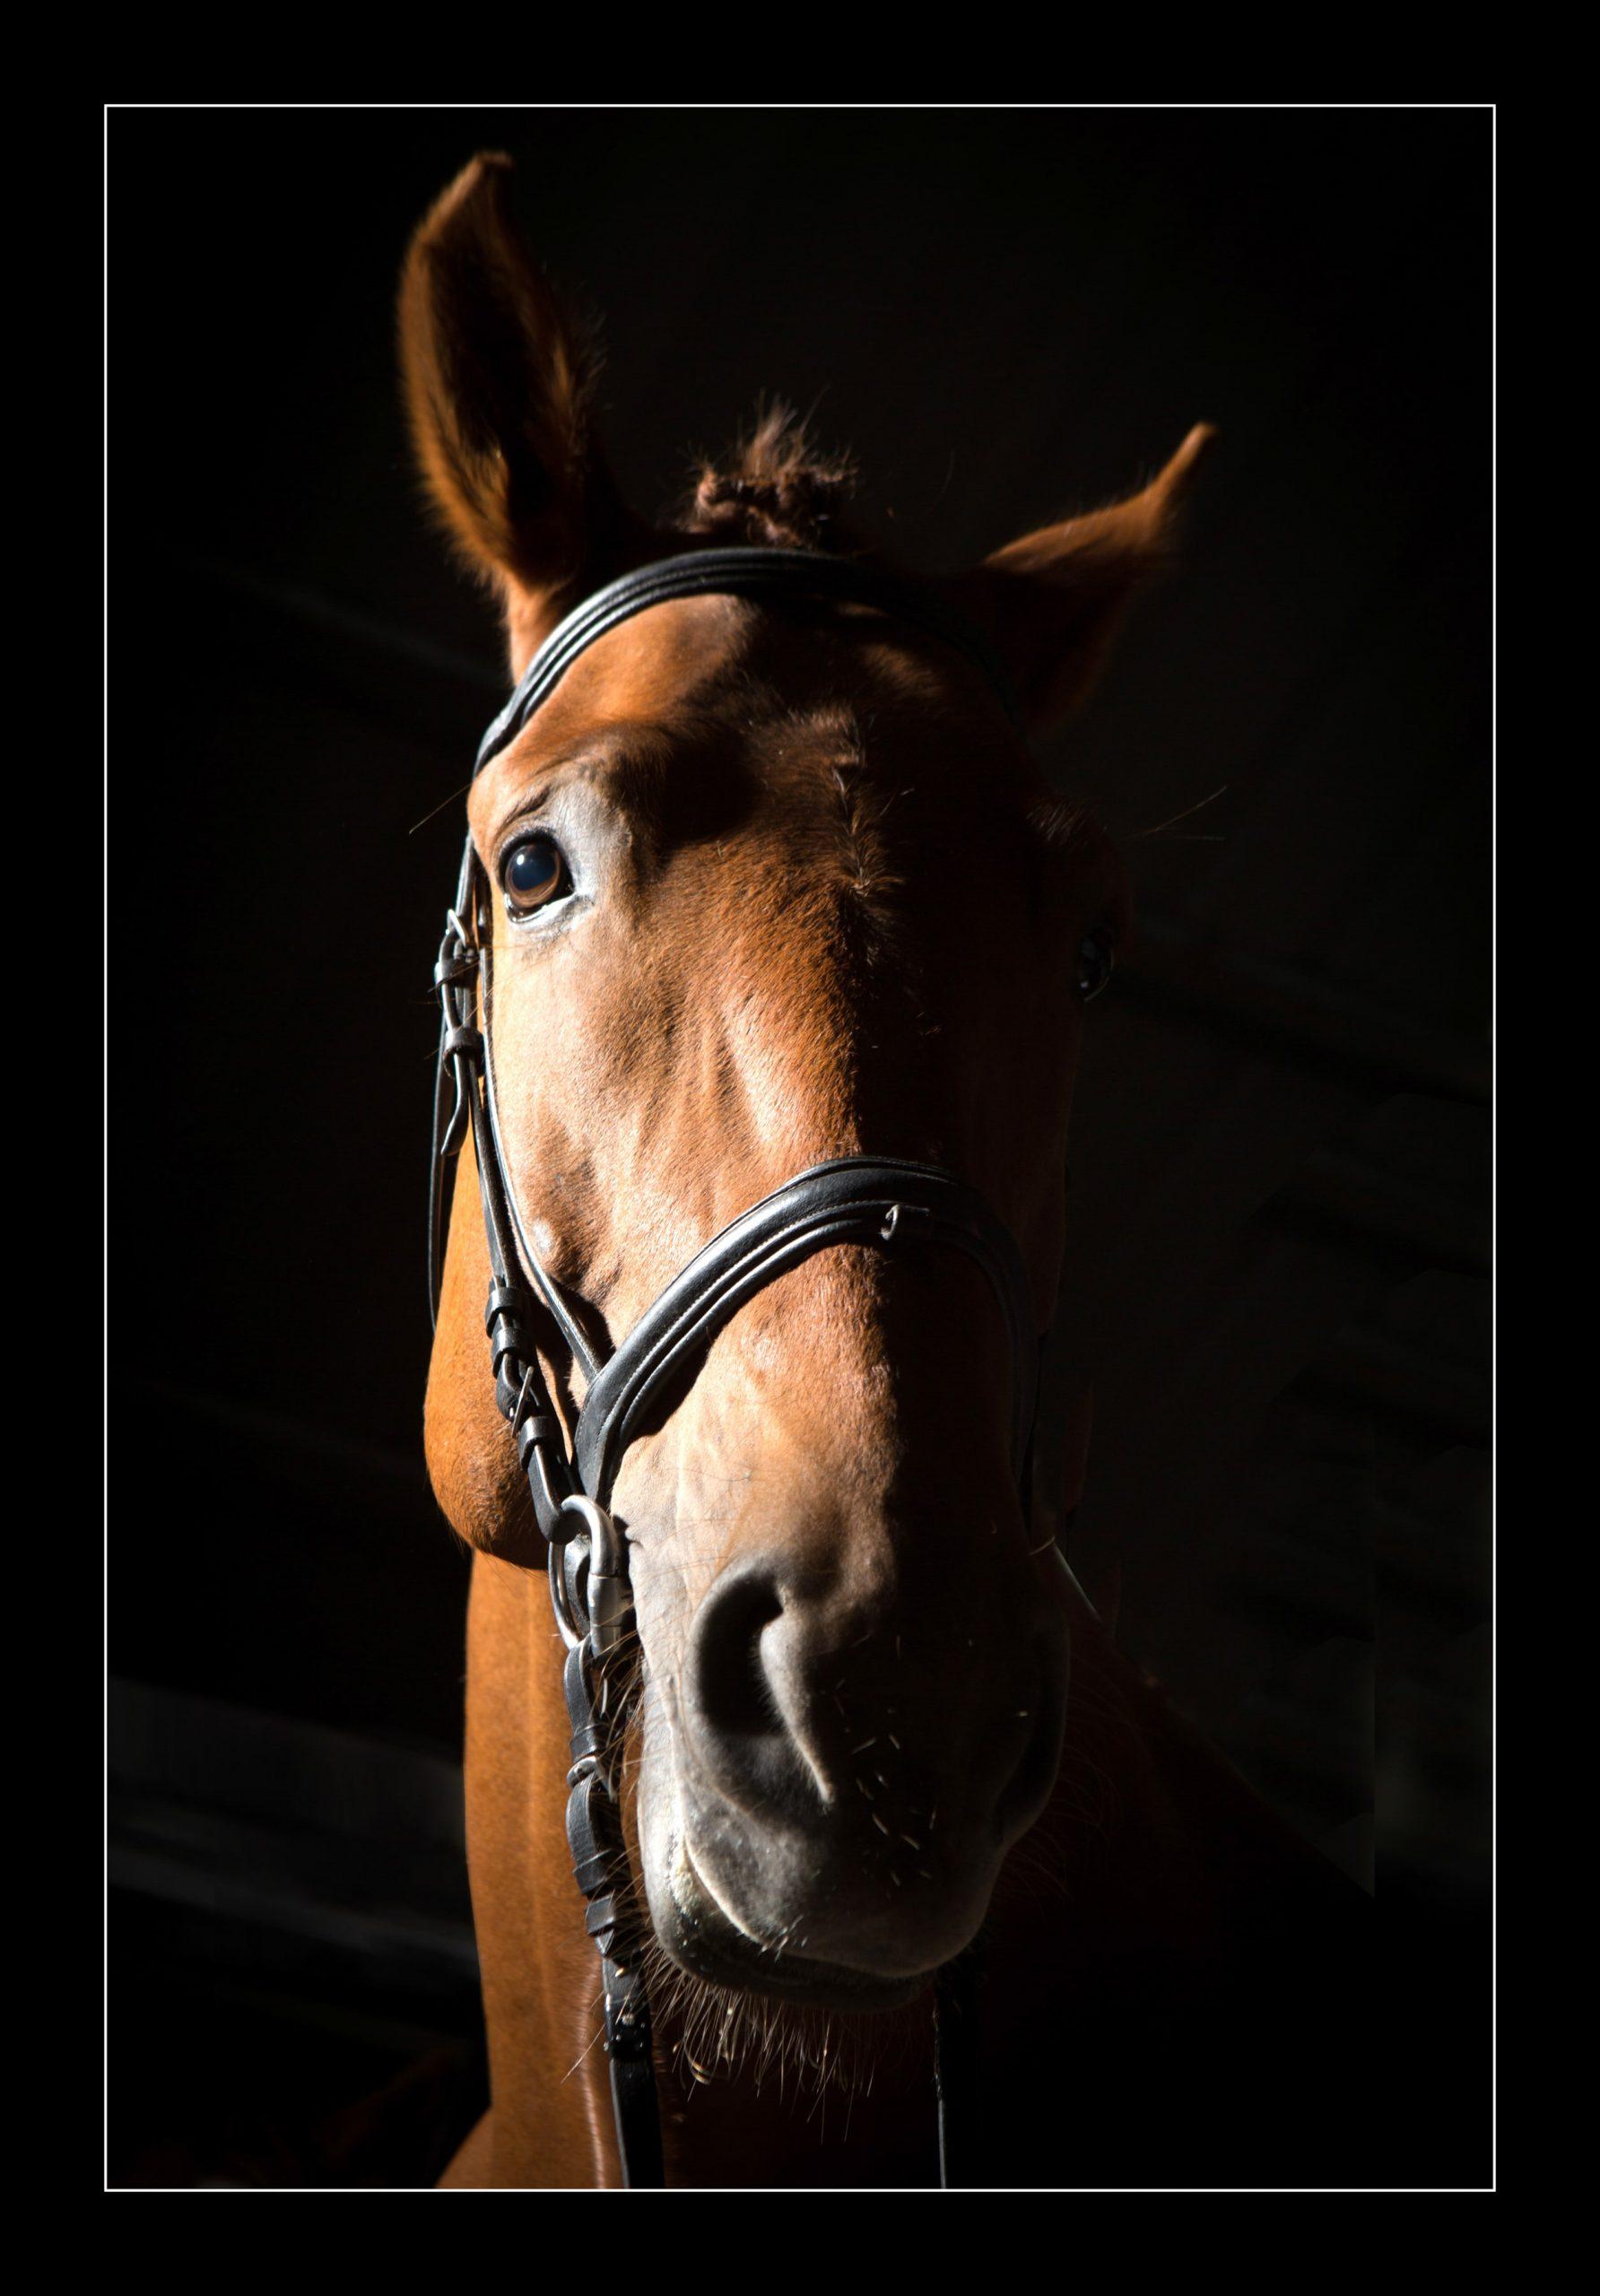 equine-6401 copy-min